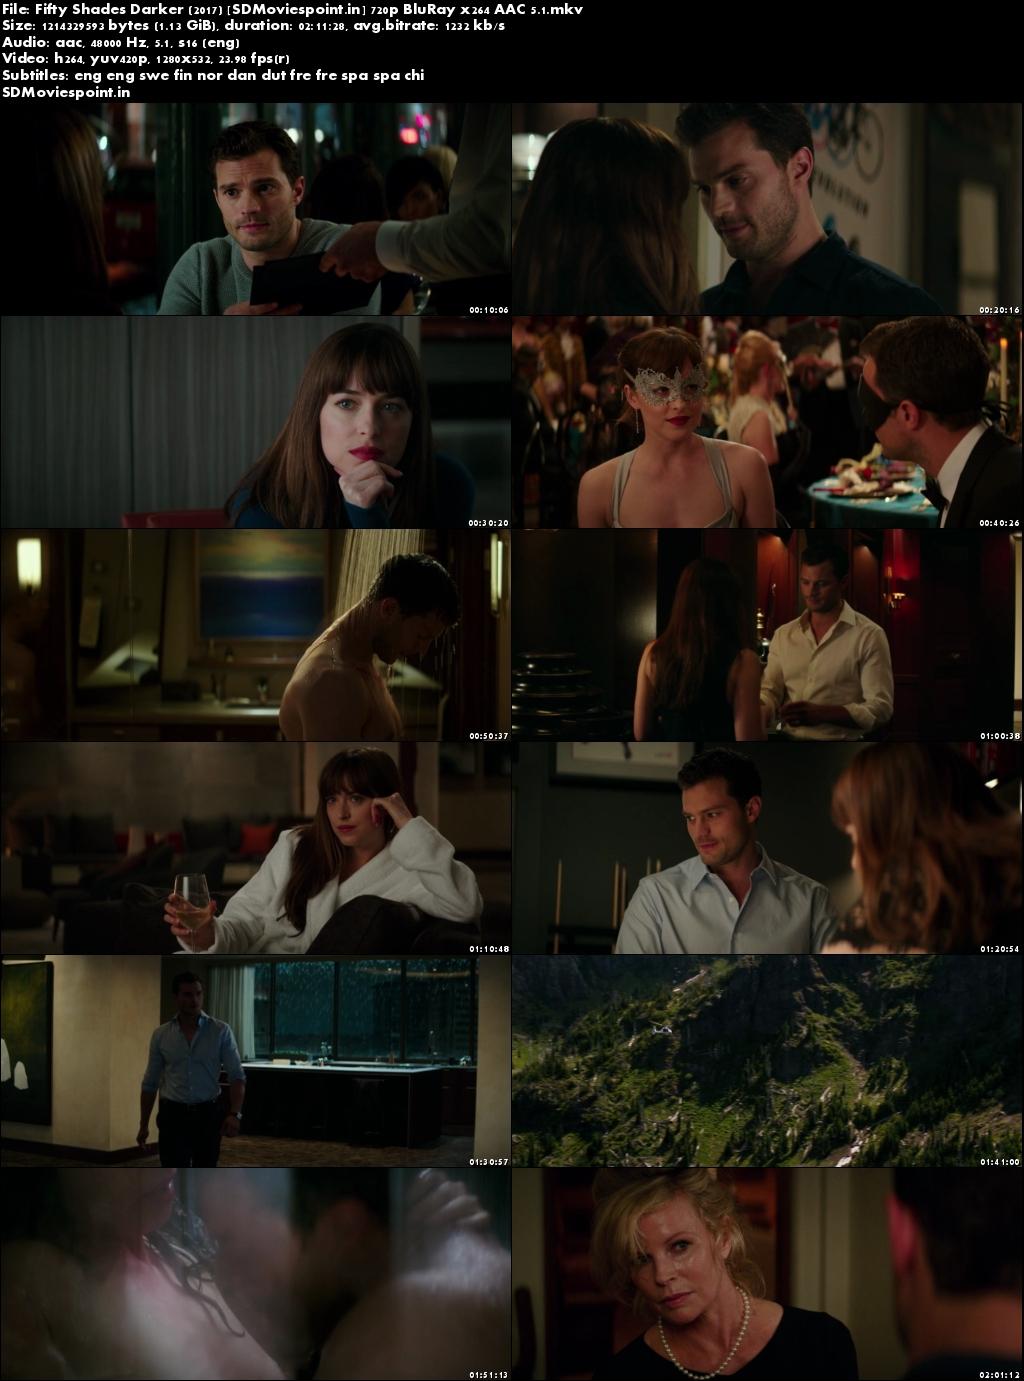 Screen Shots Fifty Shades Darker (2017) Full HD Movie Download 720p